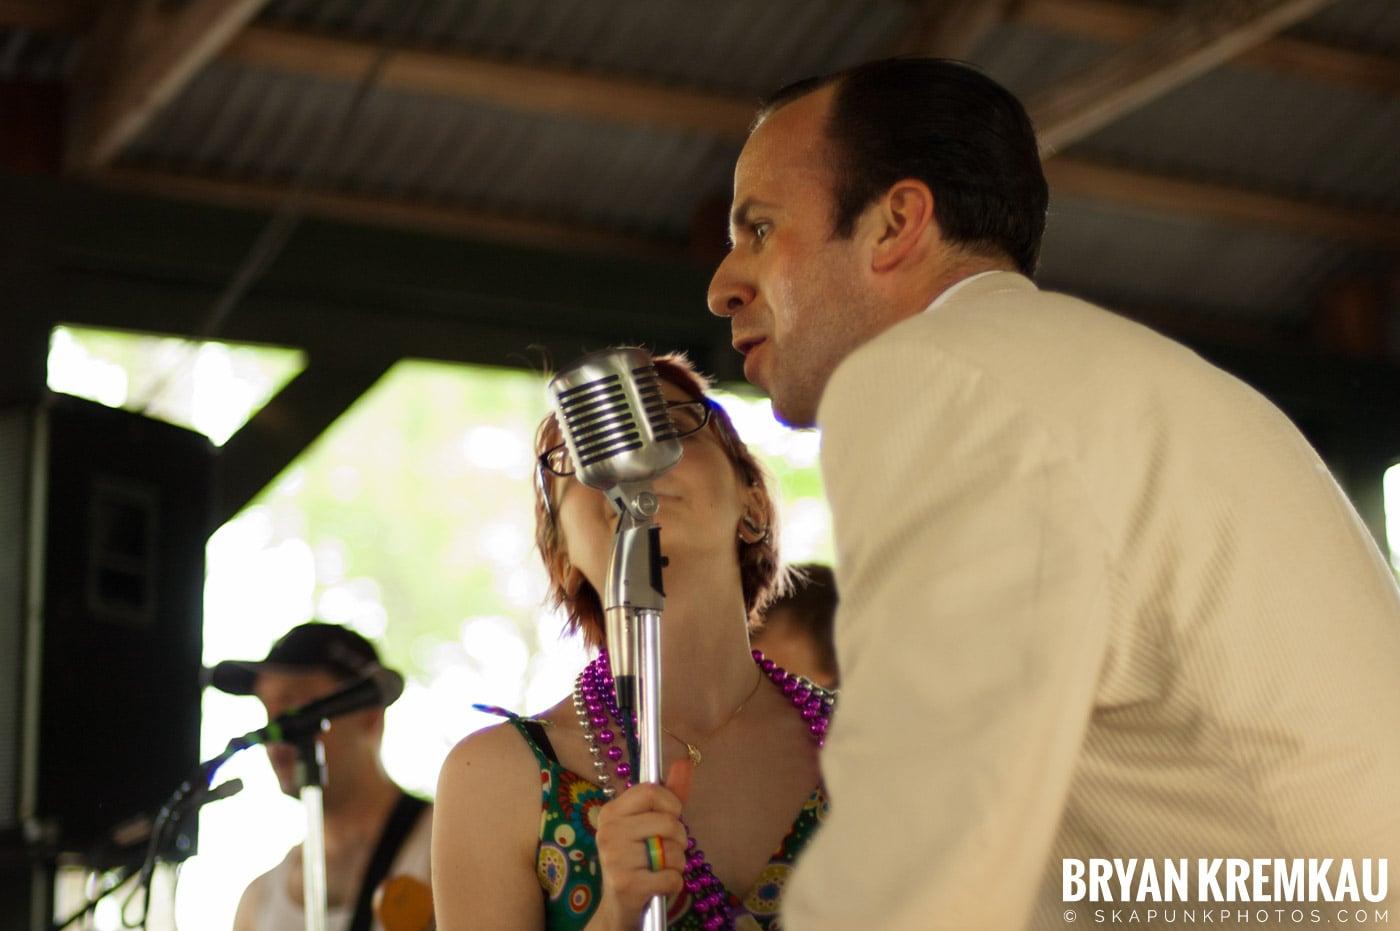 Tri-State Conspiracy @ The Big Orange Bonanza, Circleville, NY - 6.2.07 (8)